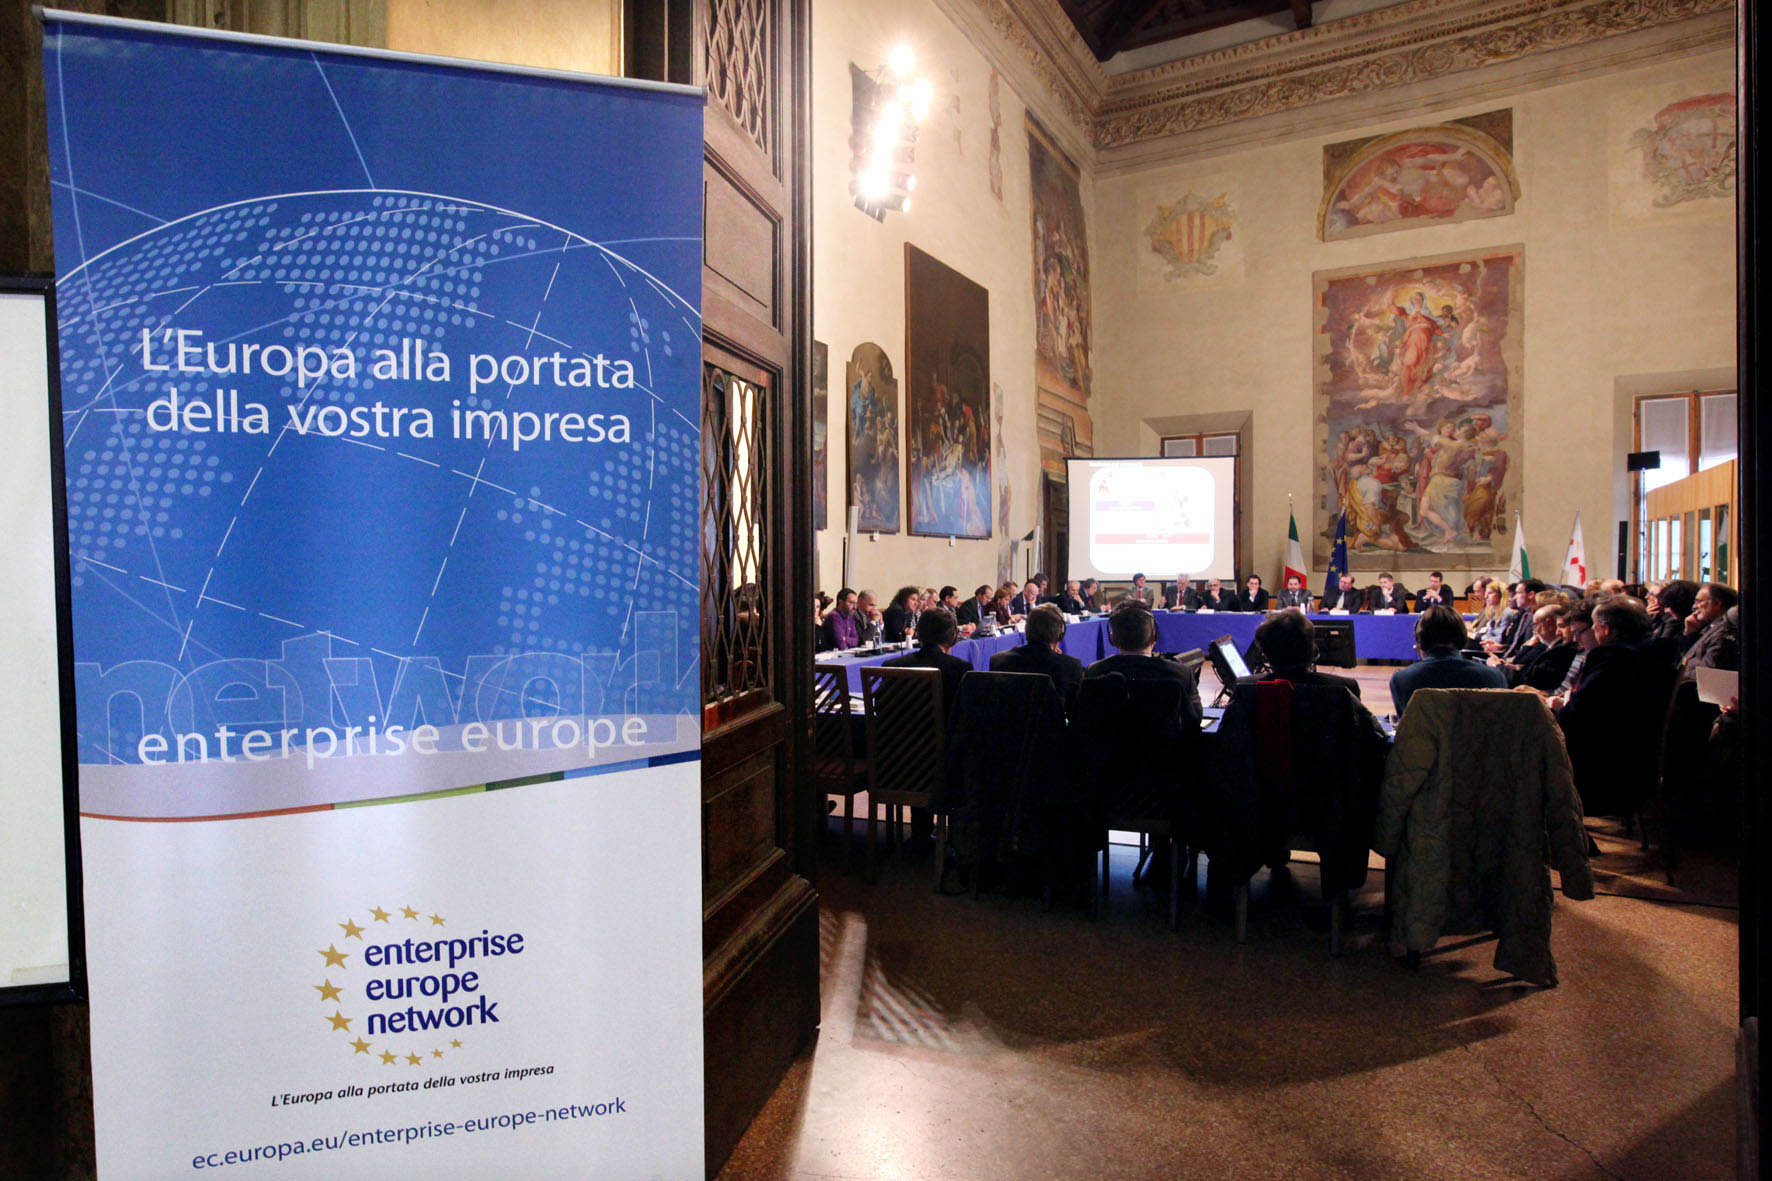 Enterprise Europe Network - foto di Unioncamere Emilia-Romagna